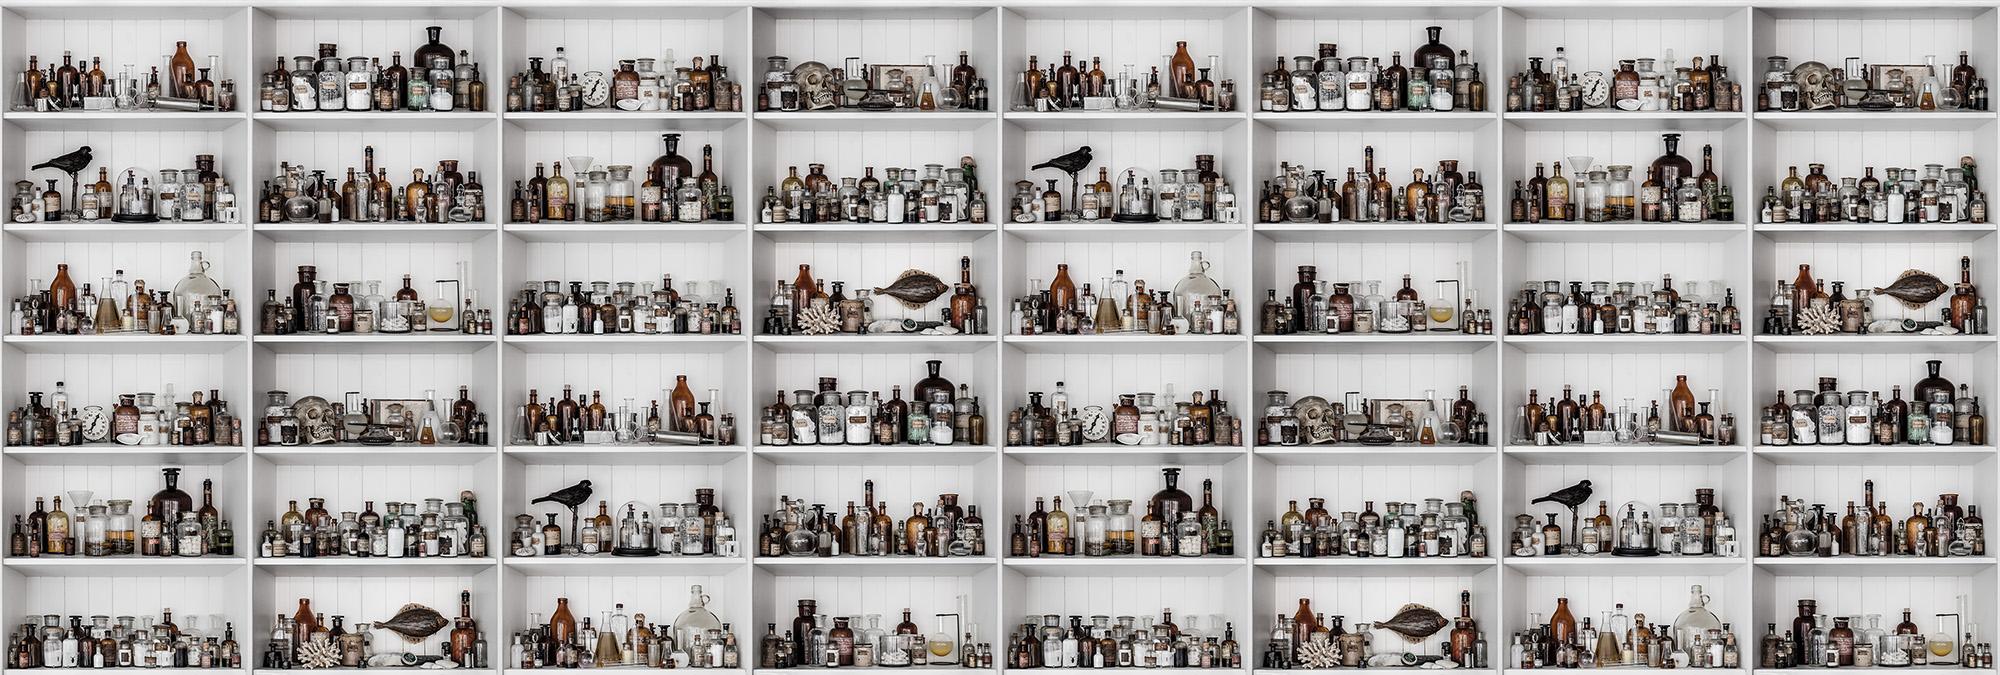 Cabinet of Curios RAW